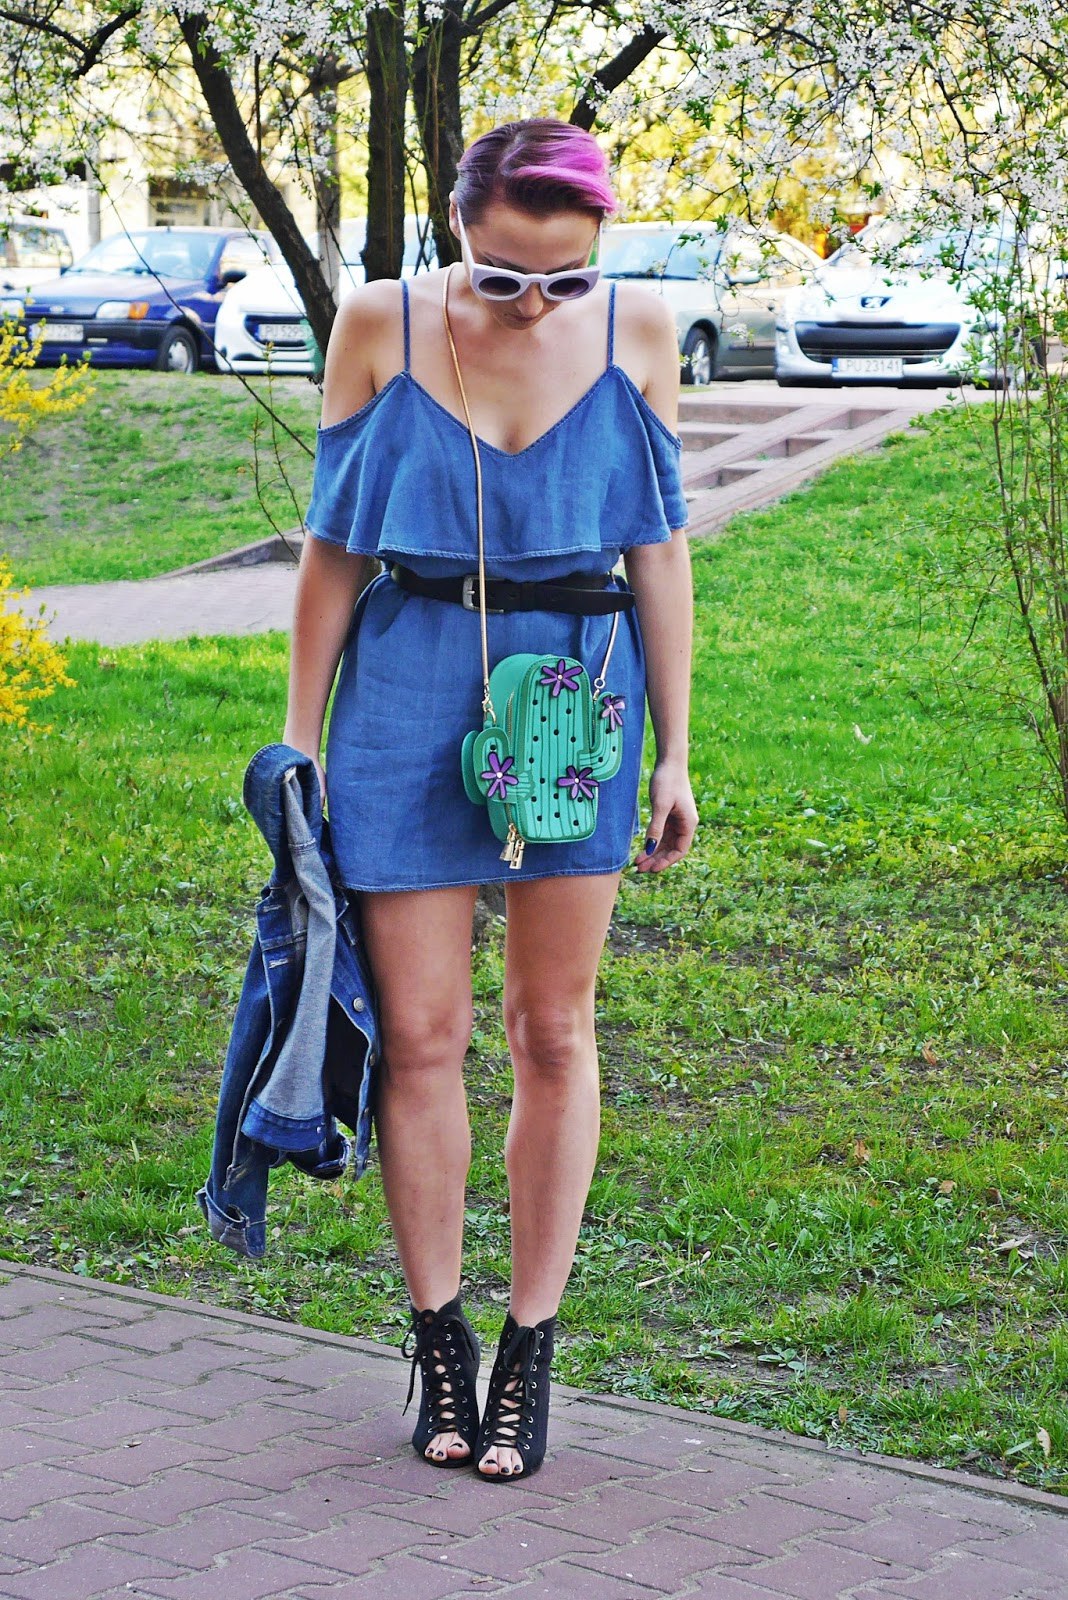 denim_dress_cactus_bag_zaful_sammydress_karyn_look_ootd_outfit_120417d